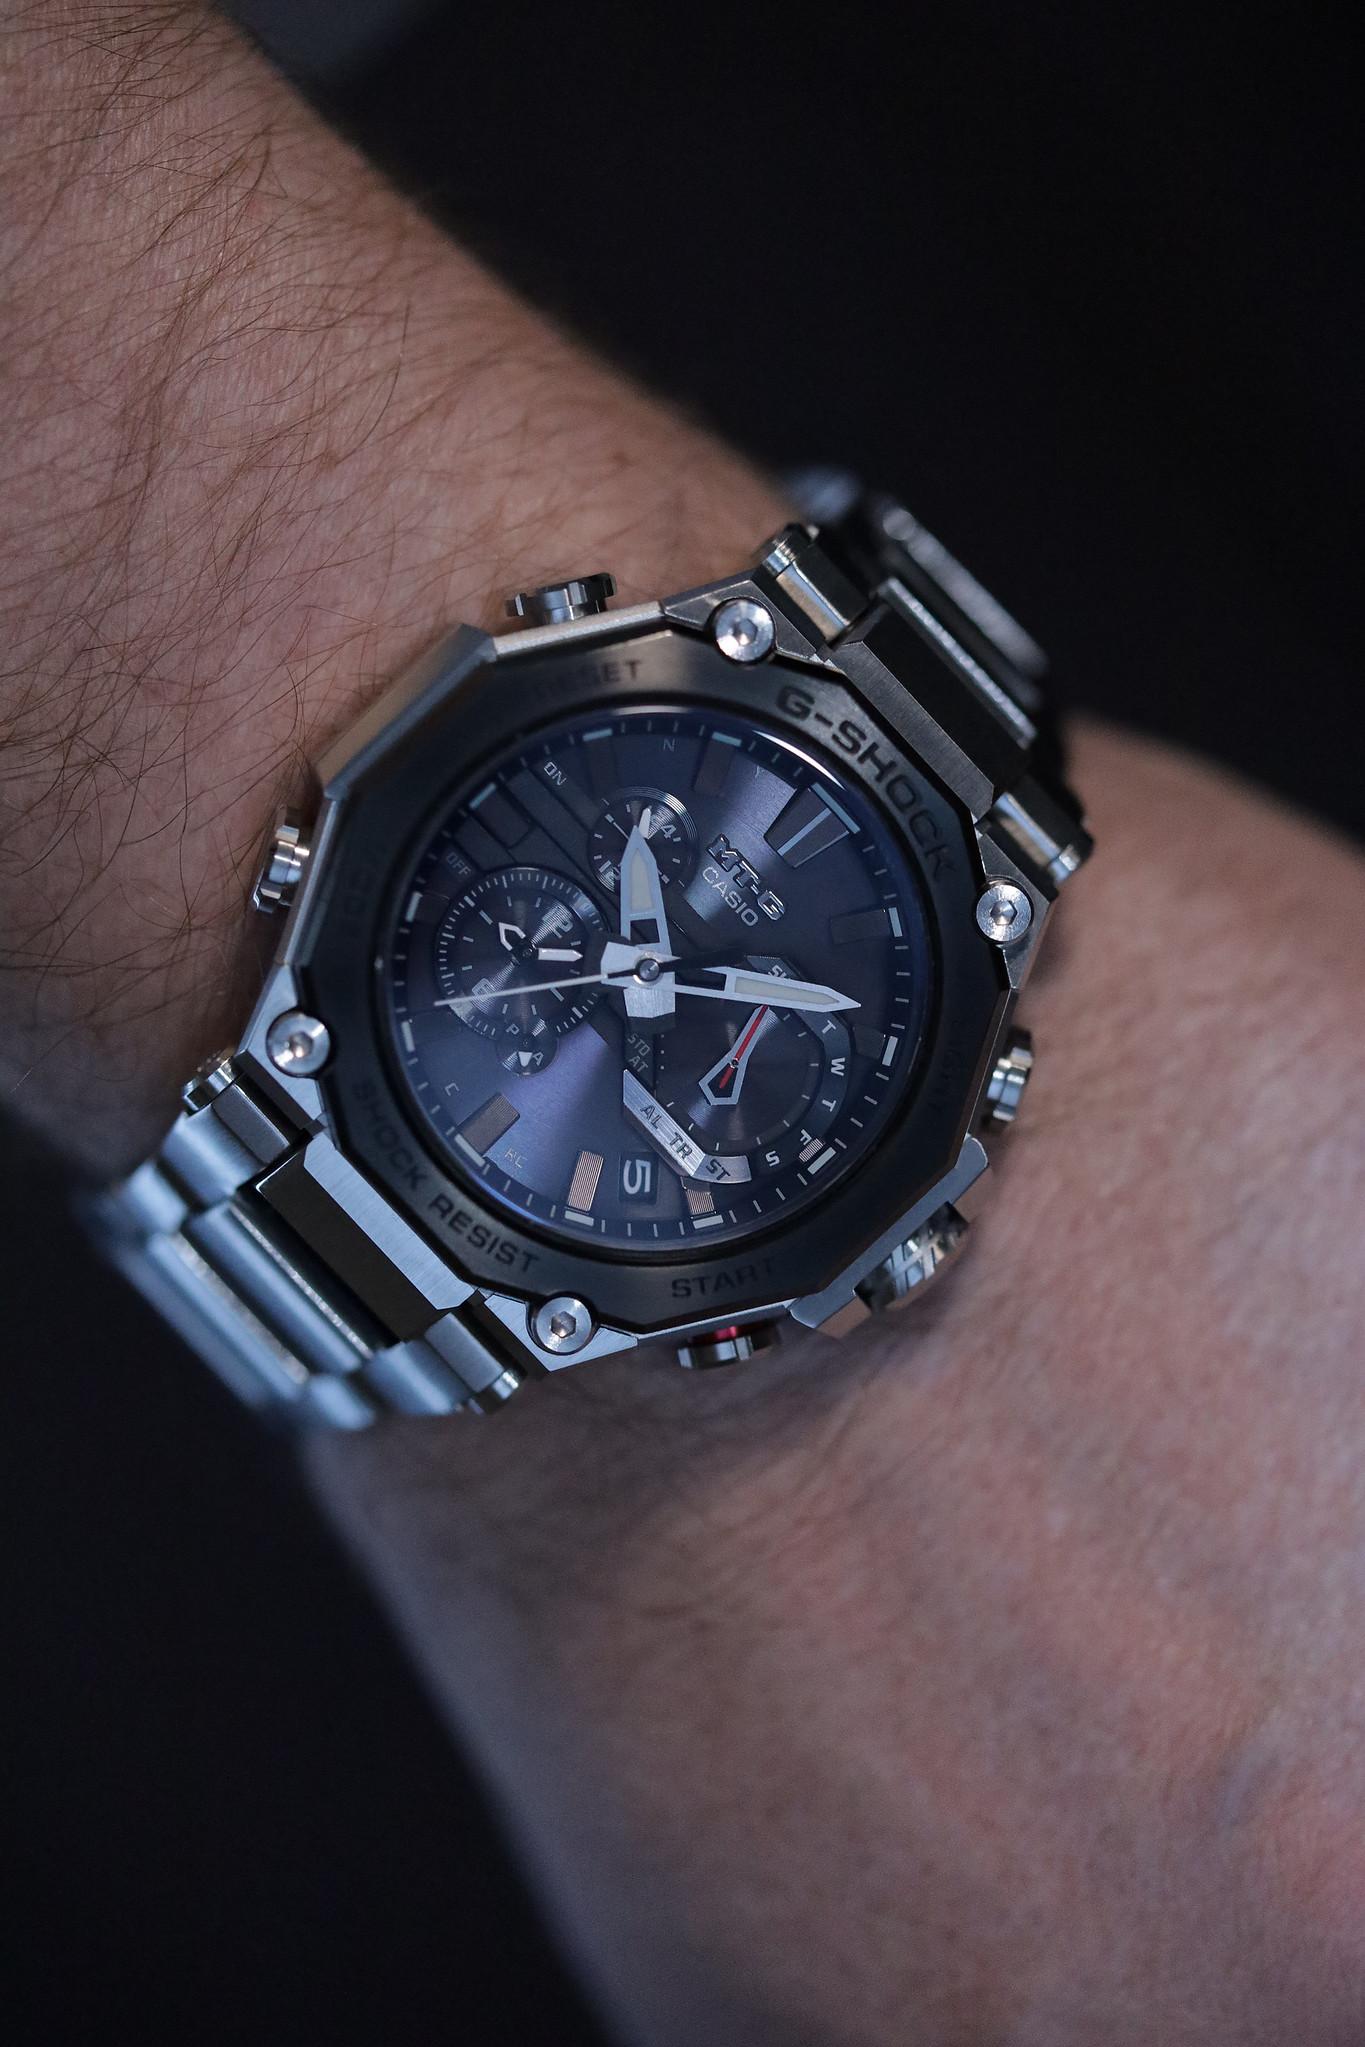 G-Shock MT-G MTGB2000D-1A wristshot